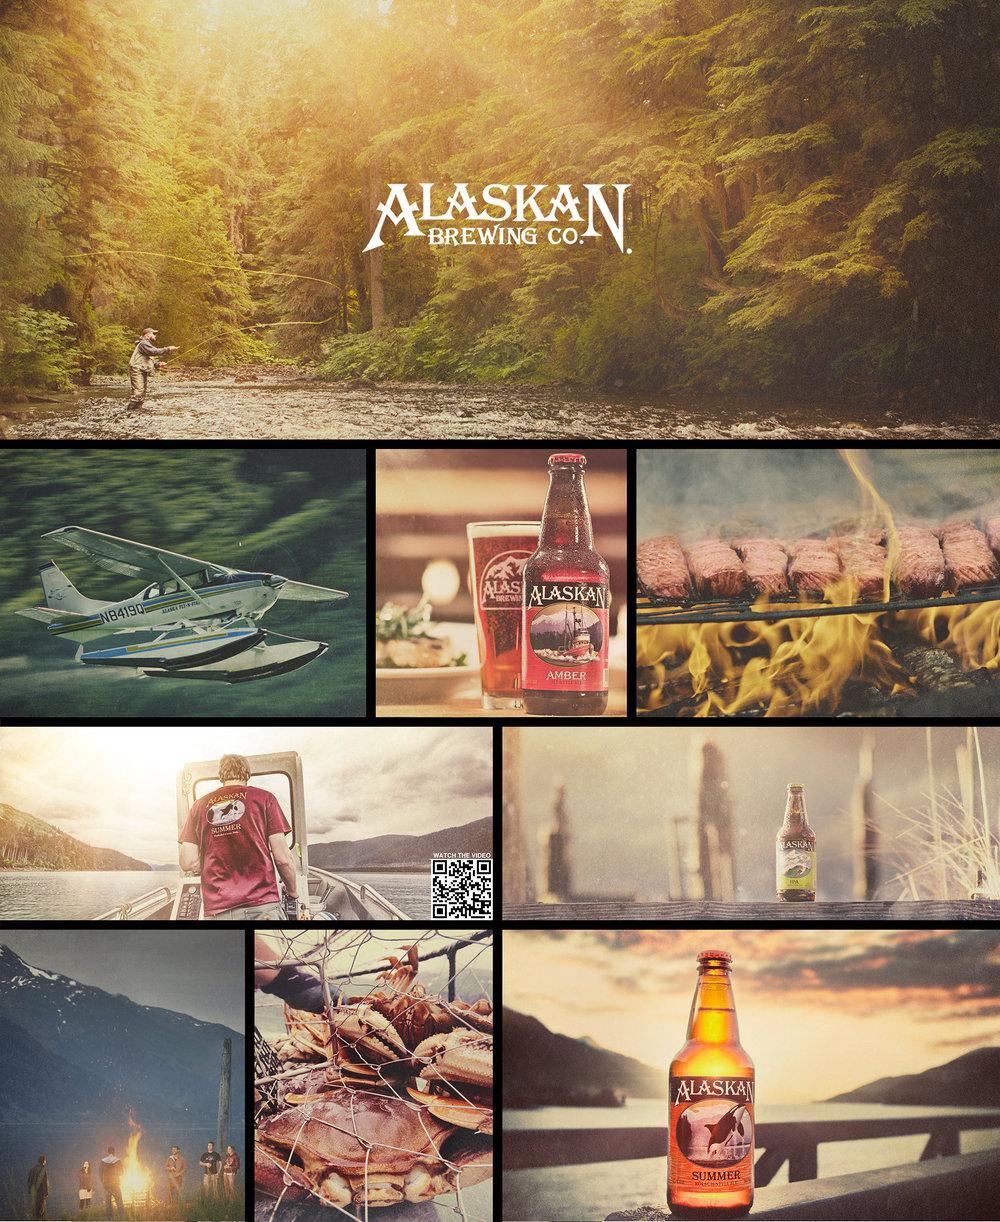 Redtail-AlaskanBC-Ads-003.jpg